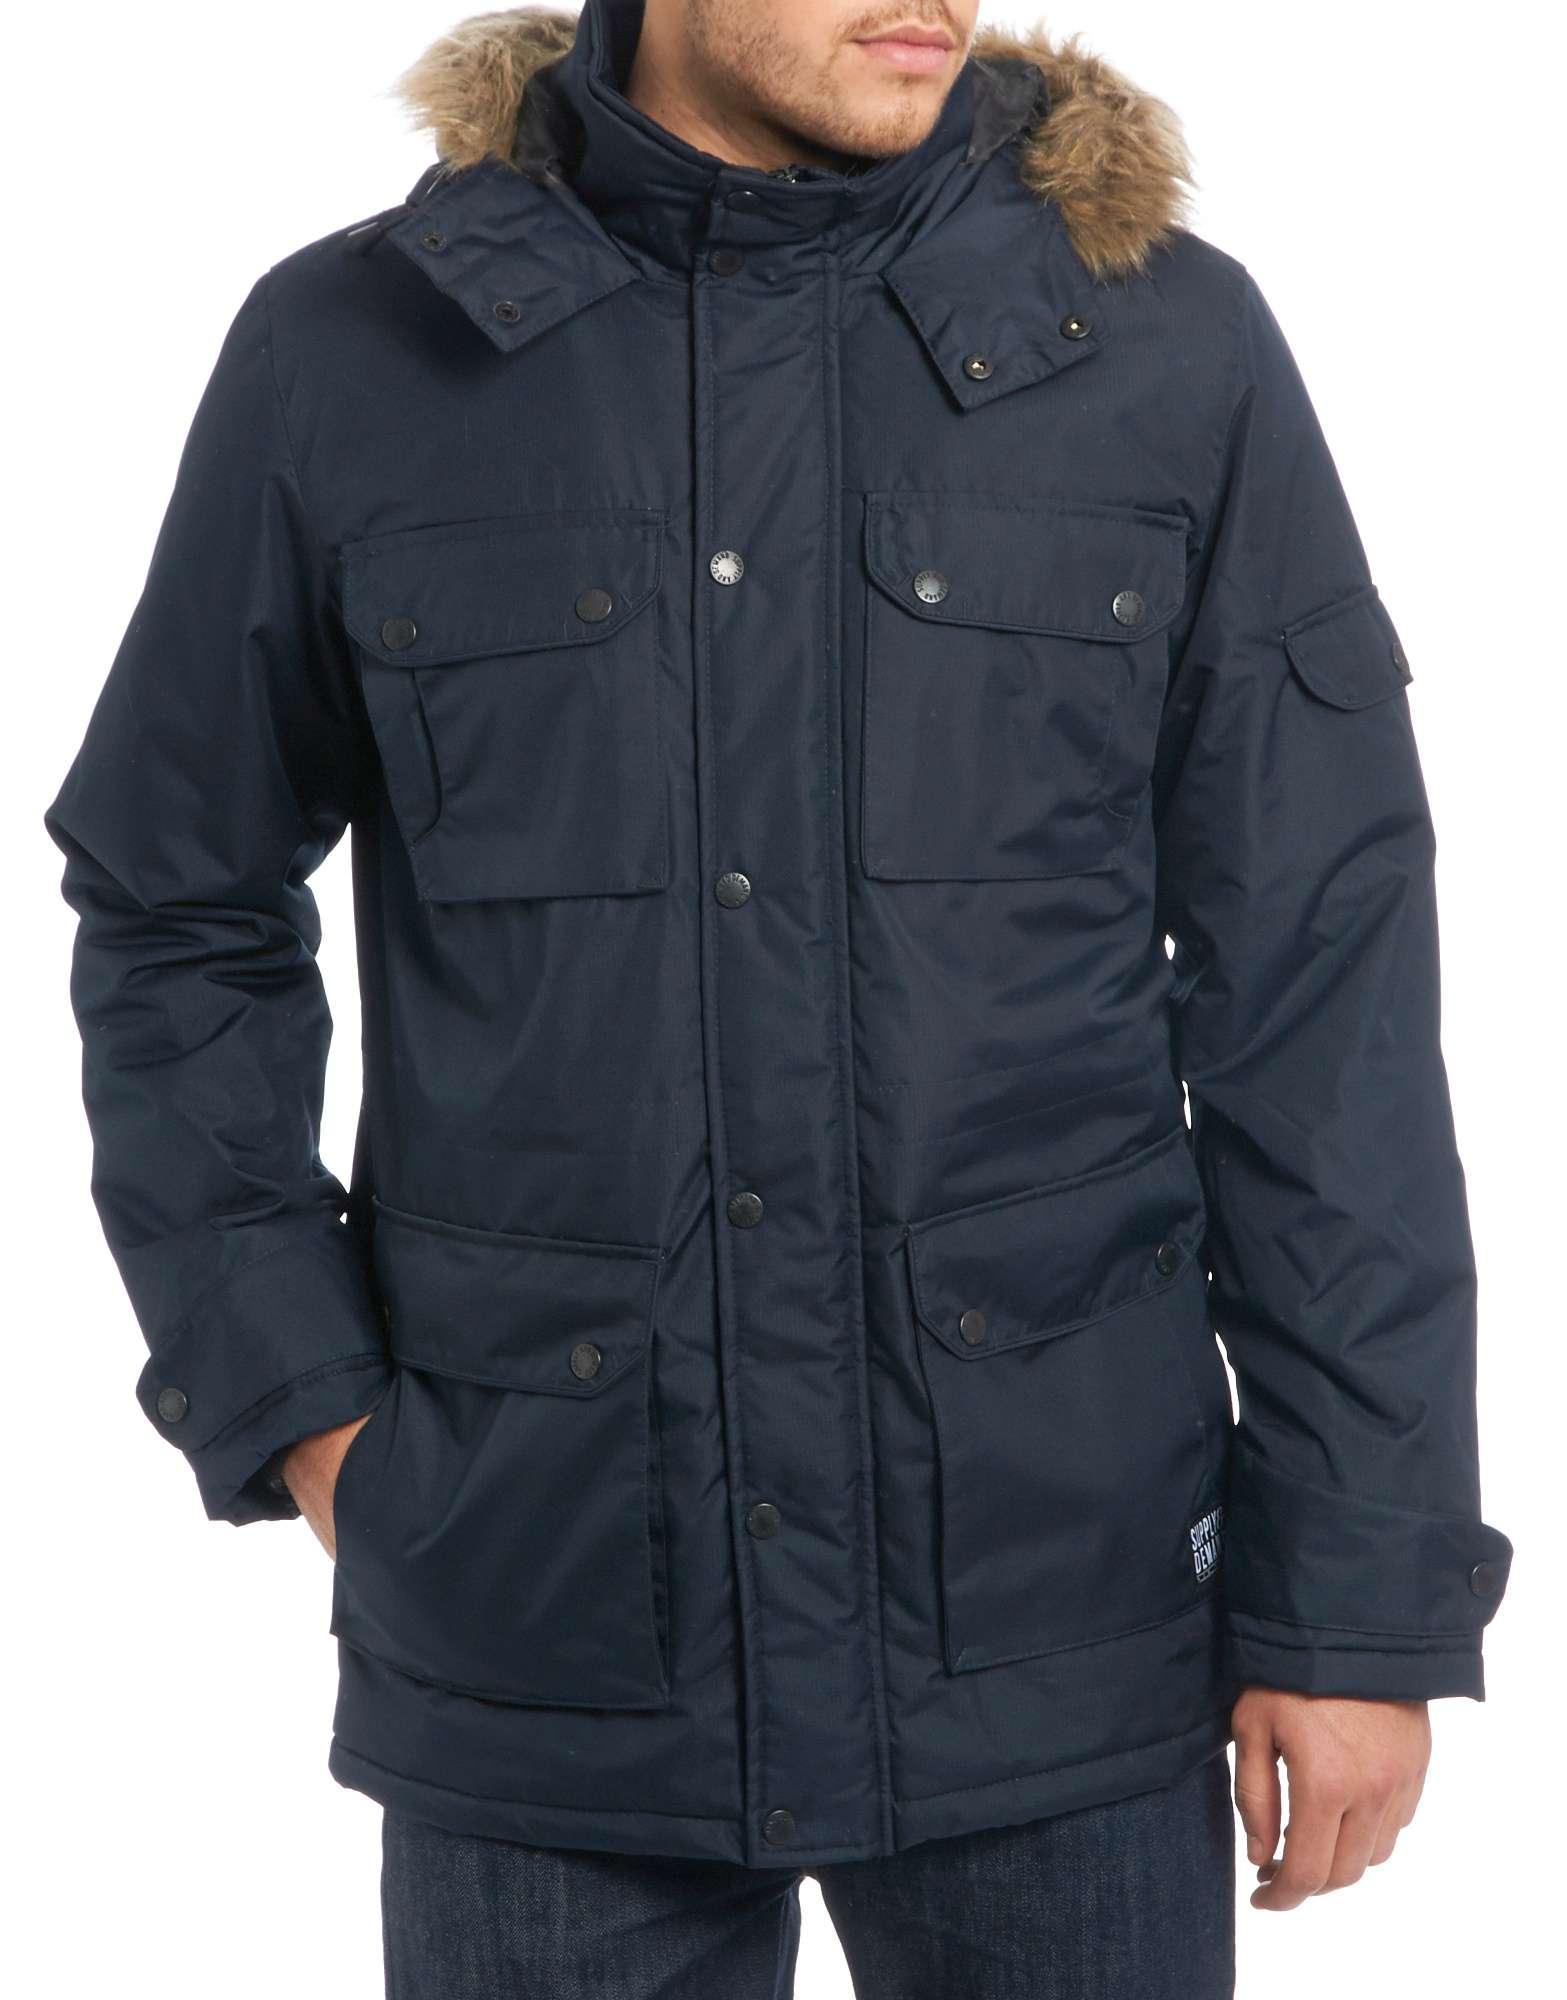 Supply & Demand Parker Jacket